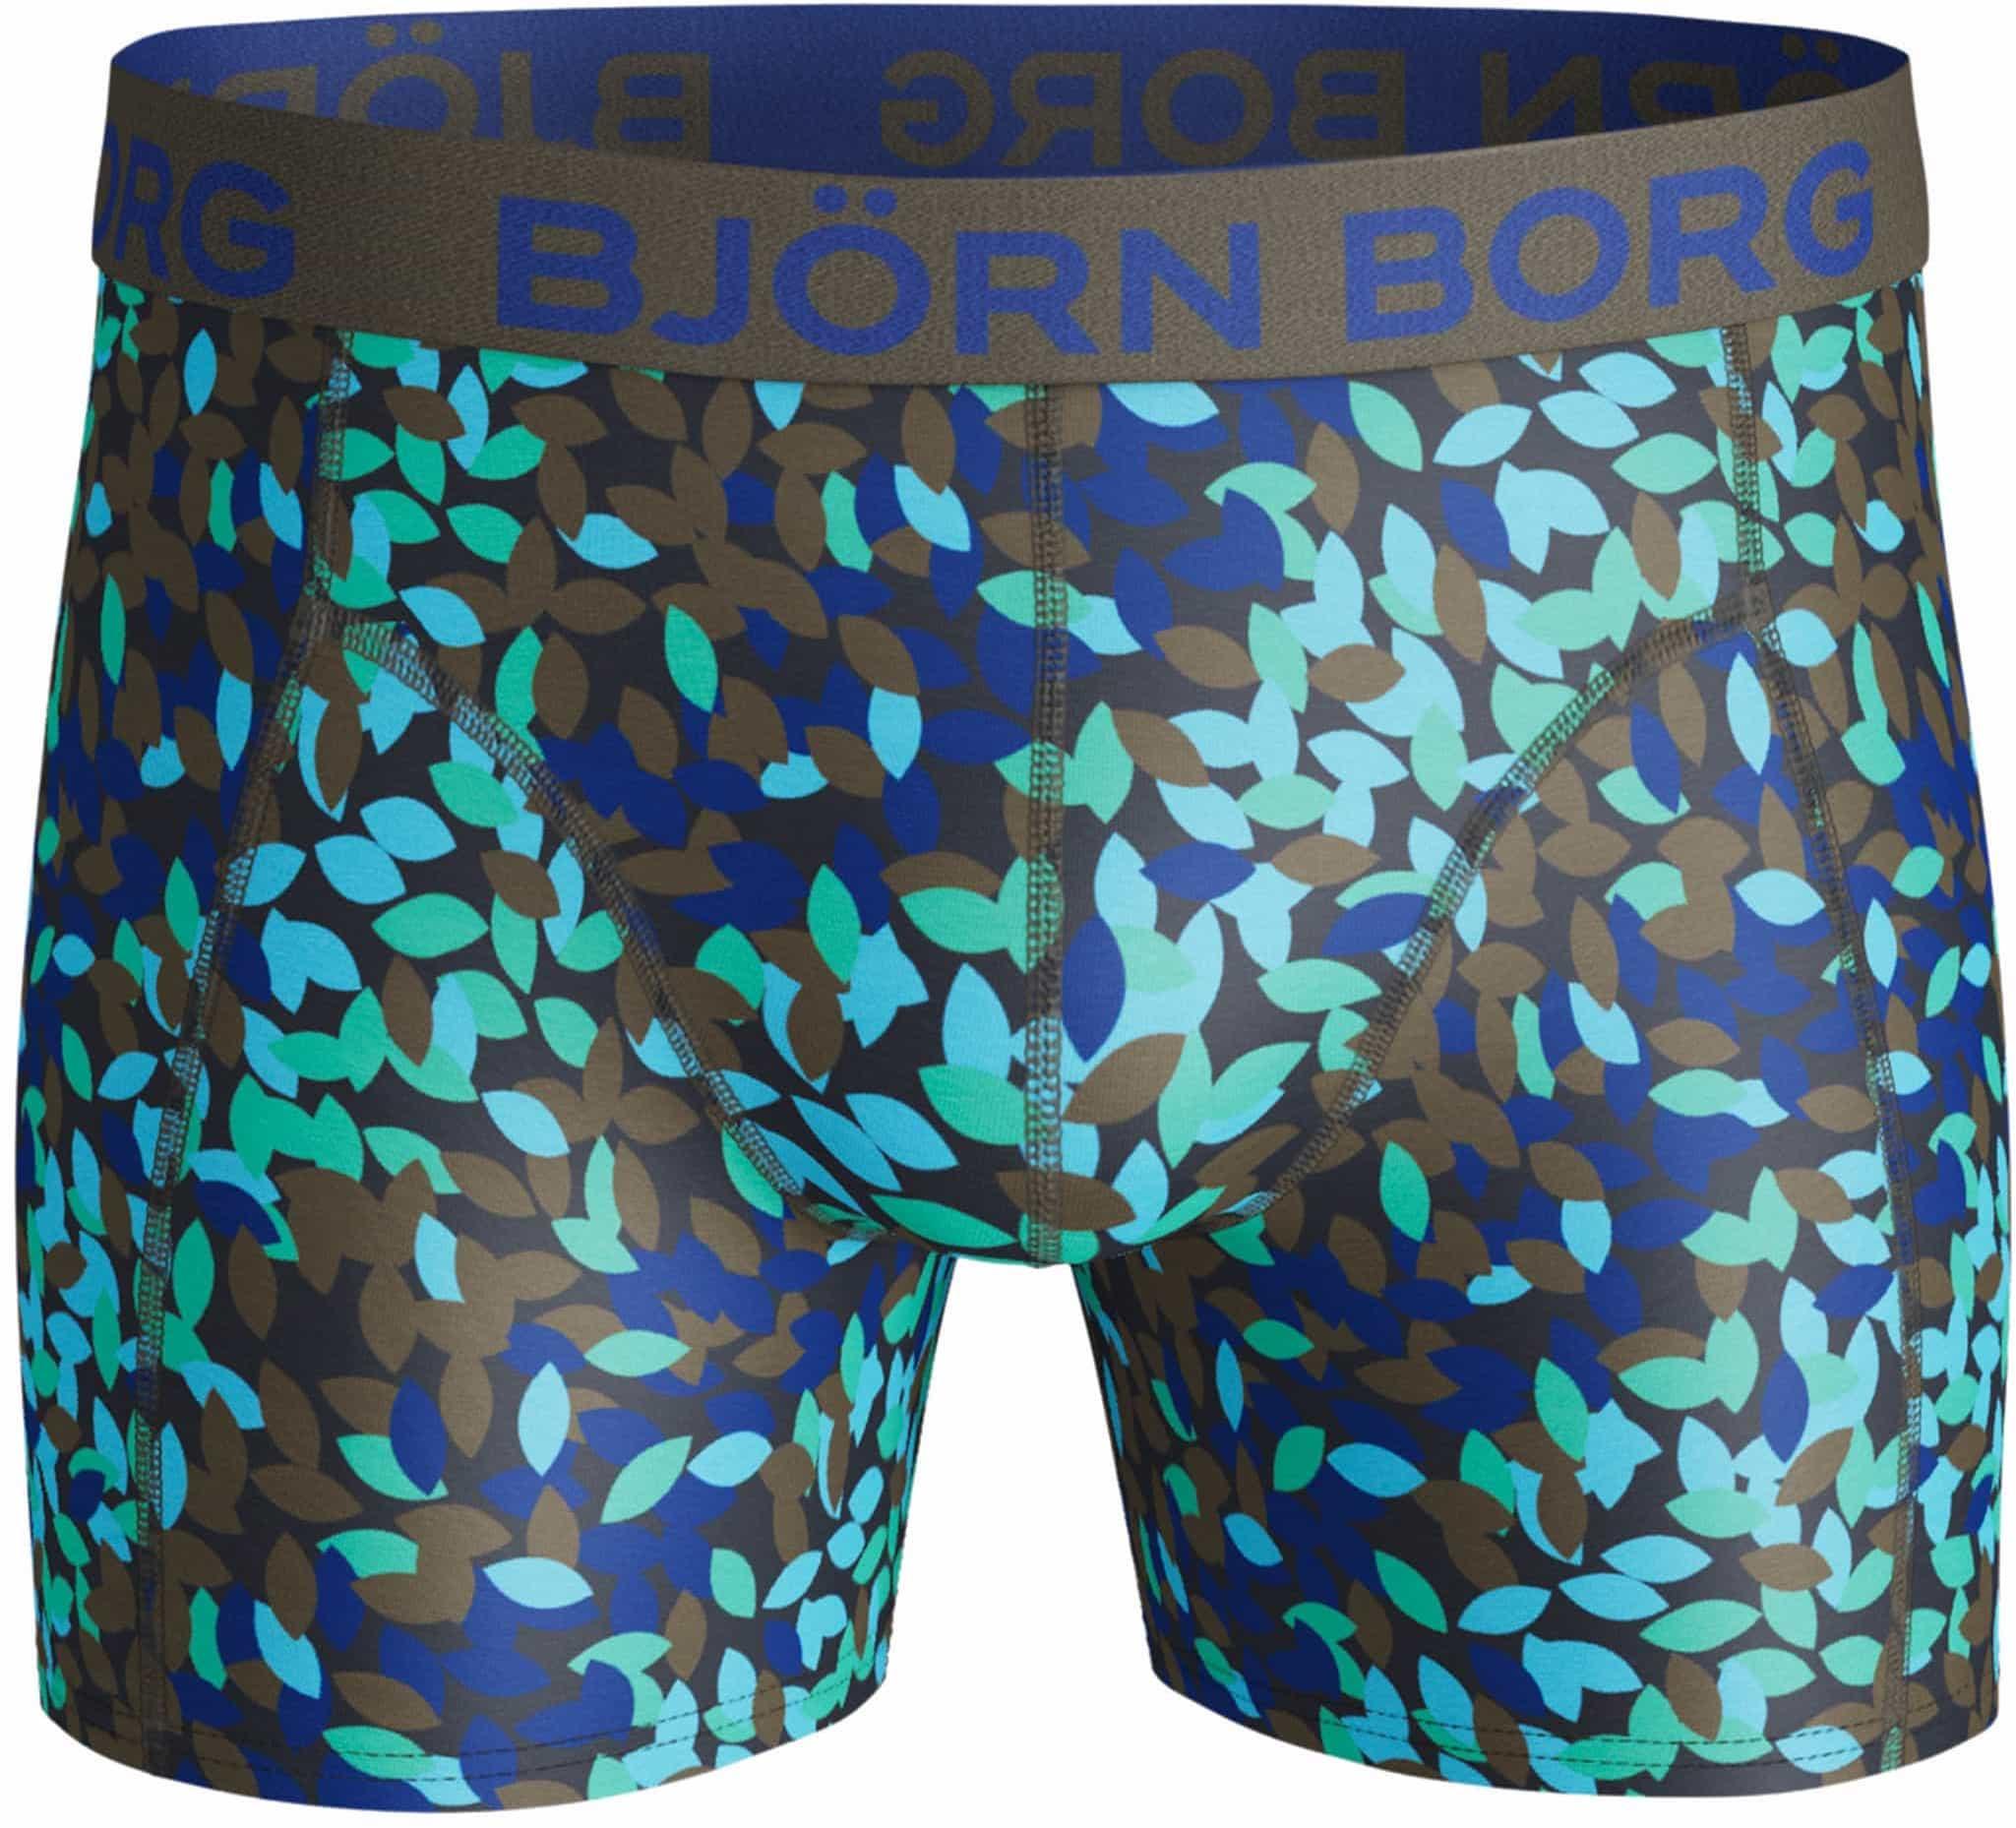 Bjorn Borg Boxers 2-Pack Blauw en Print foto 1